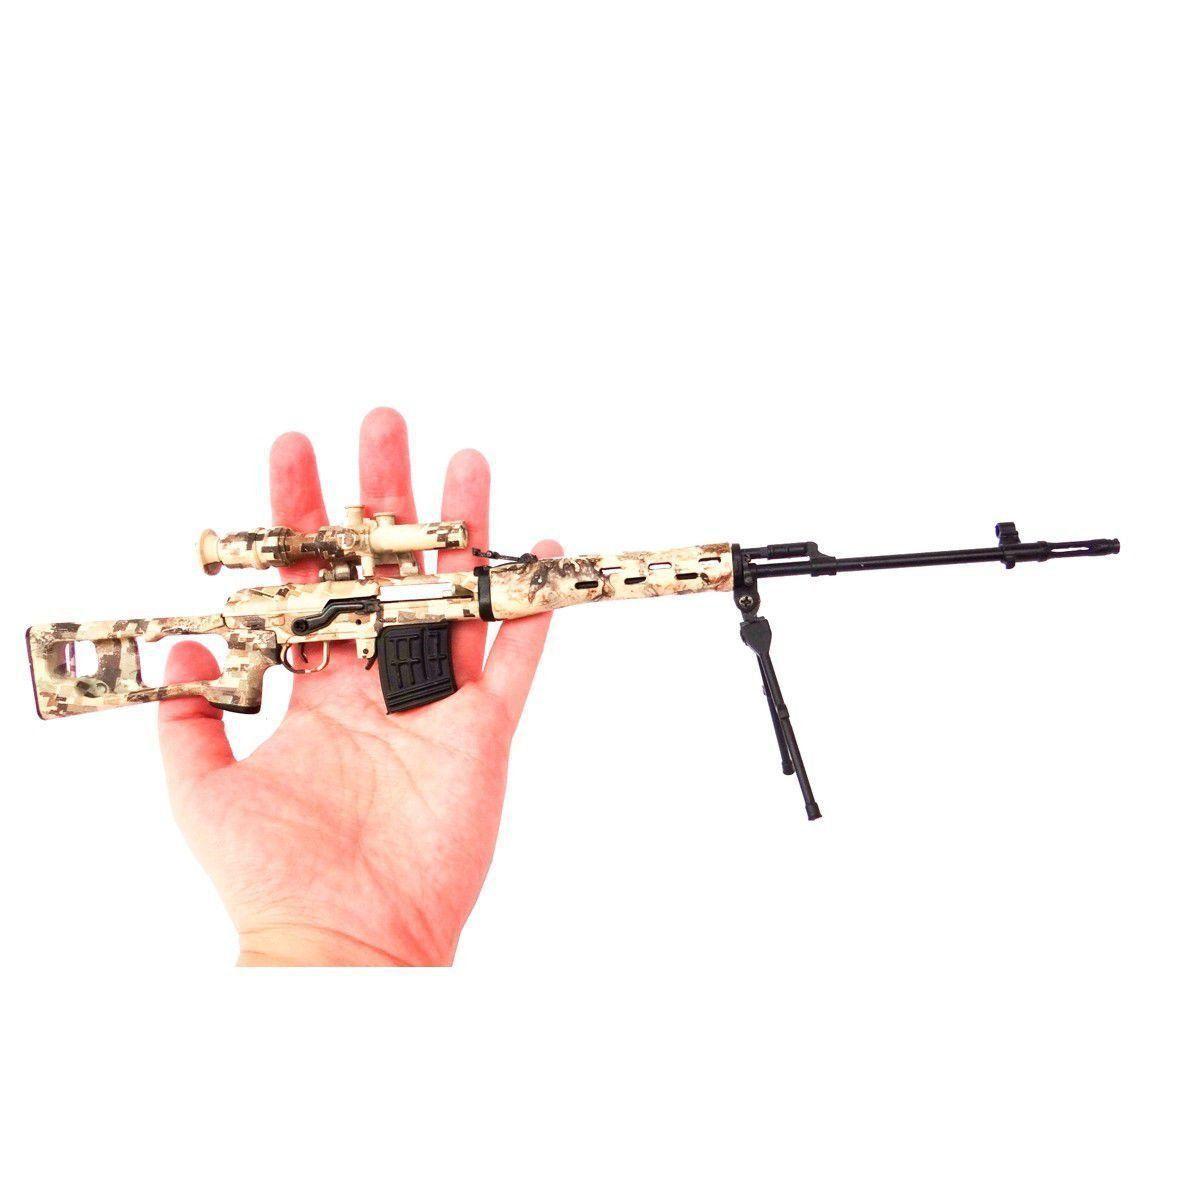 Miniatura Decorativa em Metal modelo L96-CAMO- Arsenal Guns  - Combat Airsoft